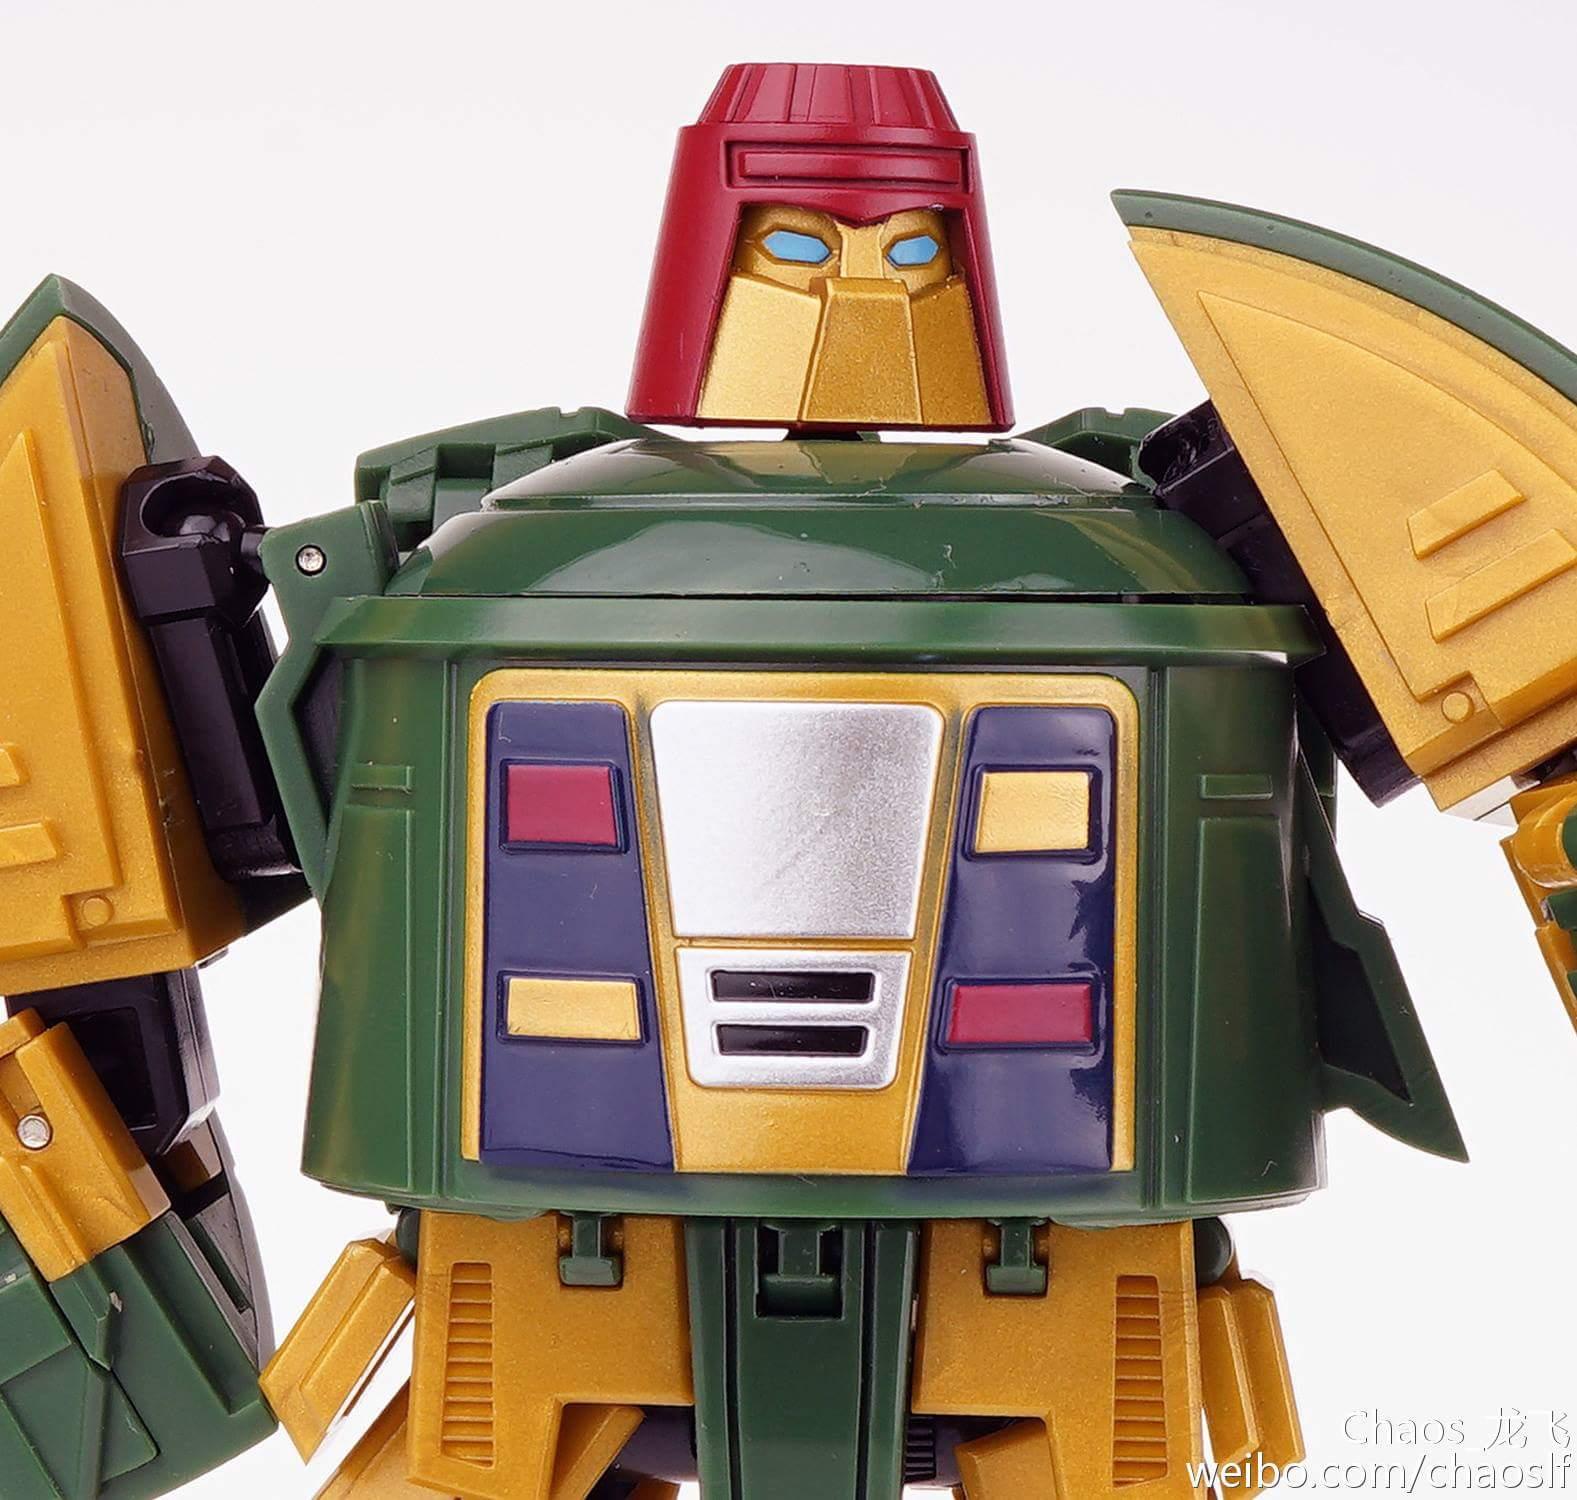 [Toyworld][Zeta Toys] Produit Tiers - Minibots MP - Gamme EX - Page 2 LKoeqRde